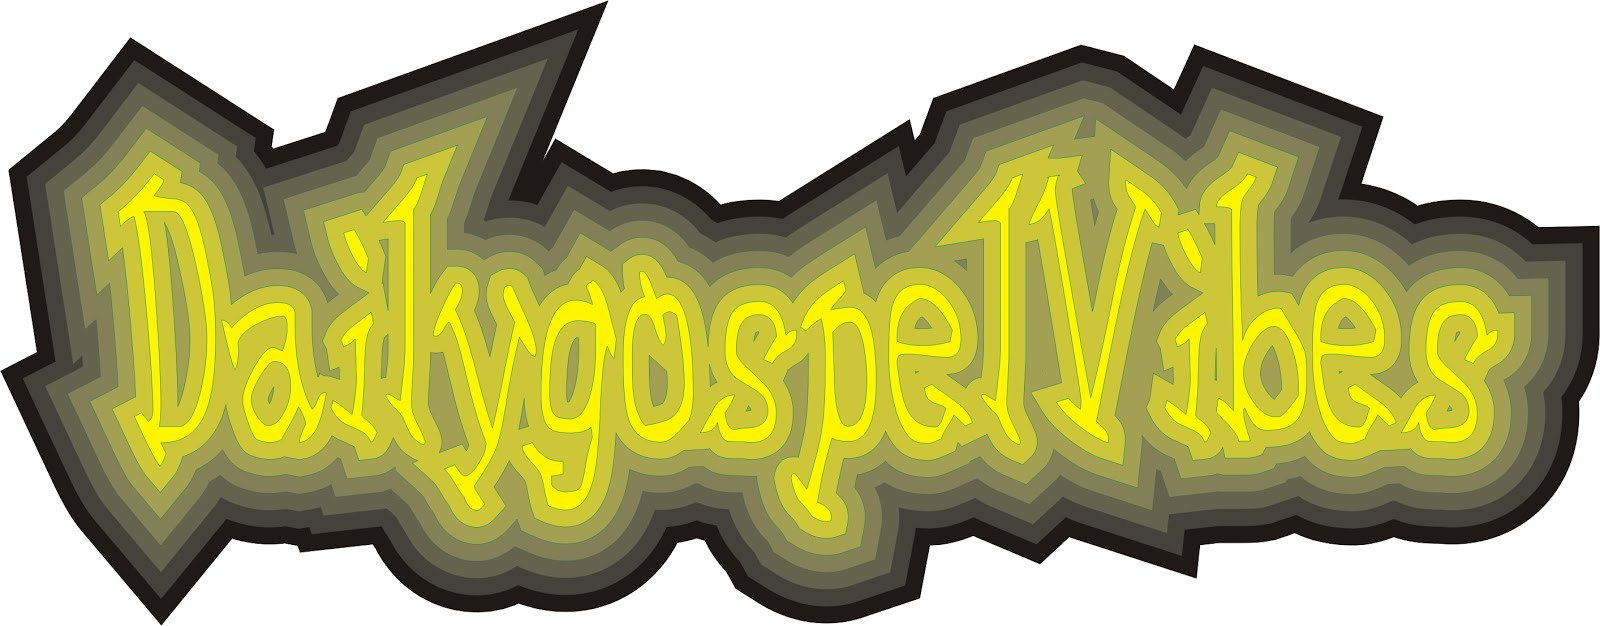 DailyGospelVibes